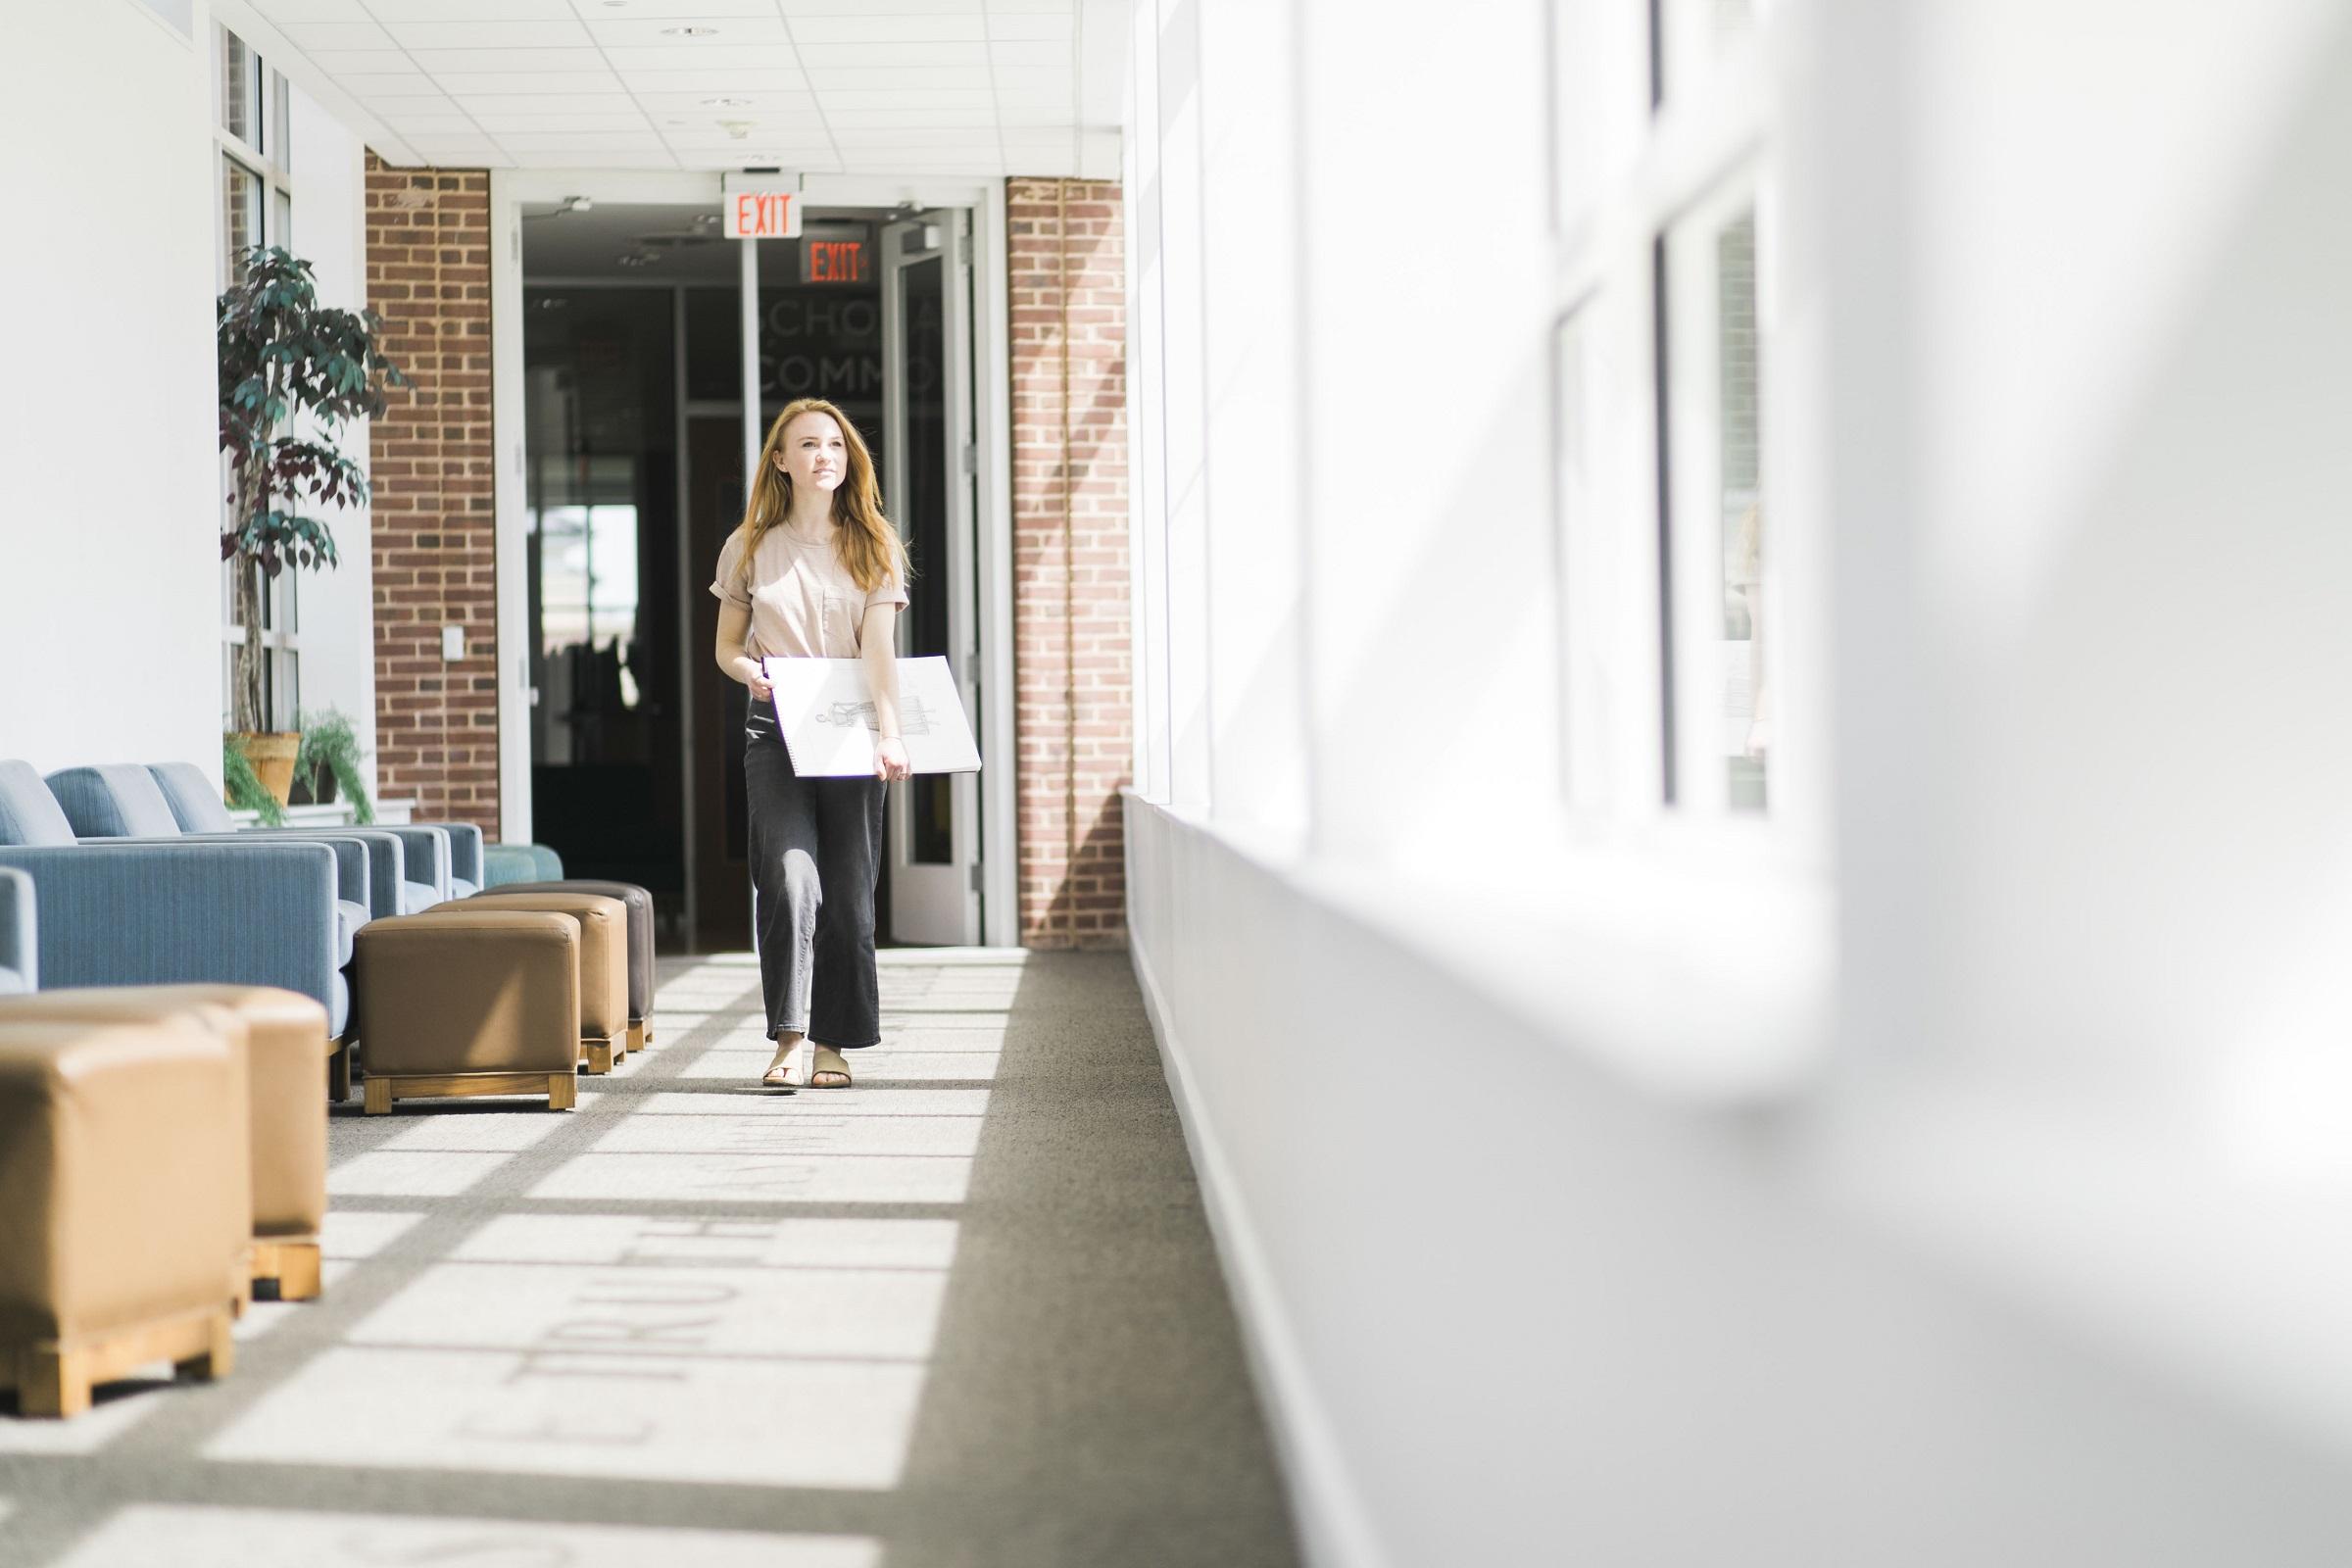 B S In Fashion Fashion Design Liberty University Programs